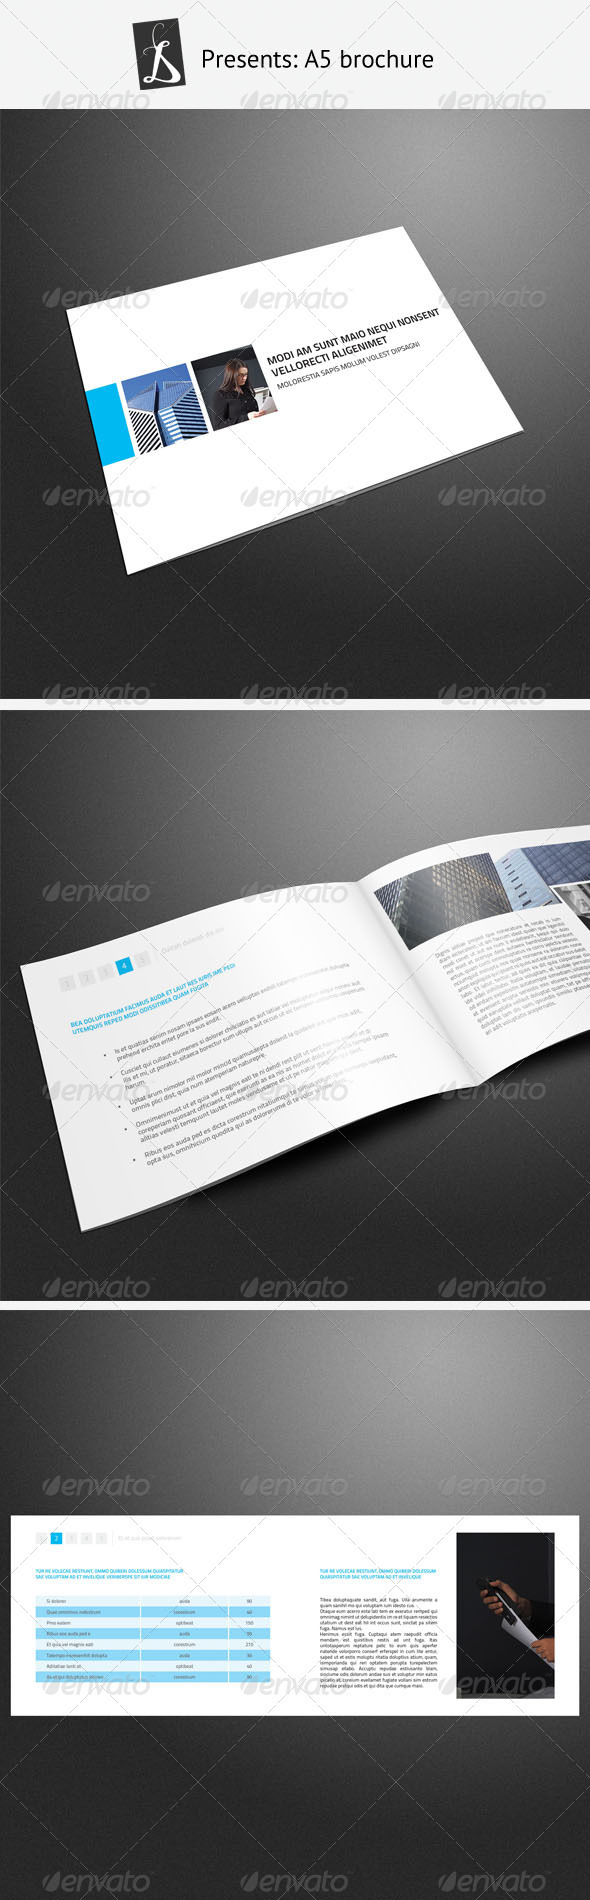 A5 Brochure 3 - Corporate Brochures